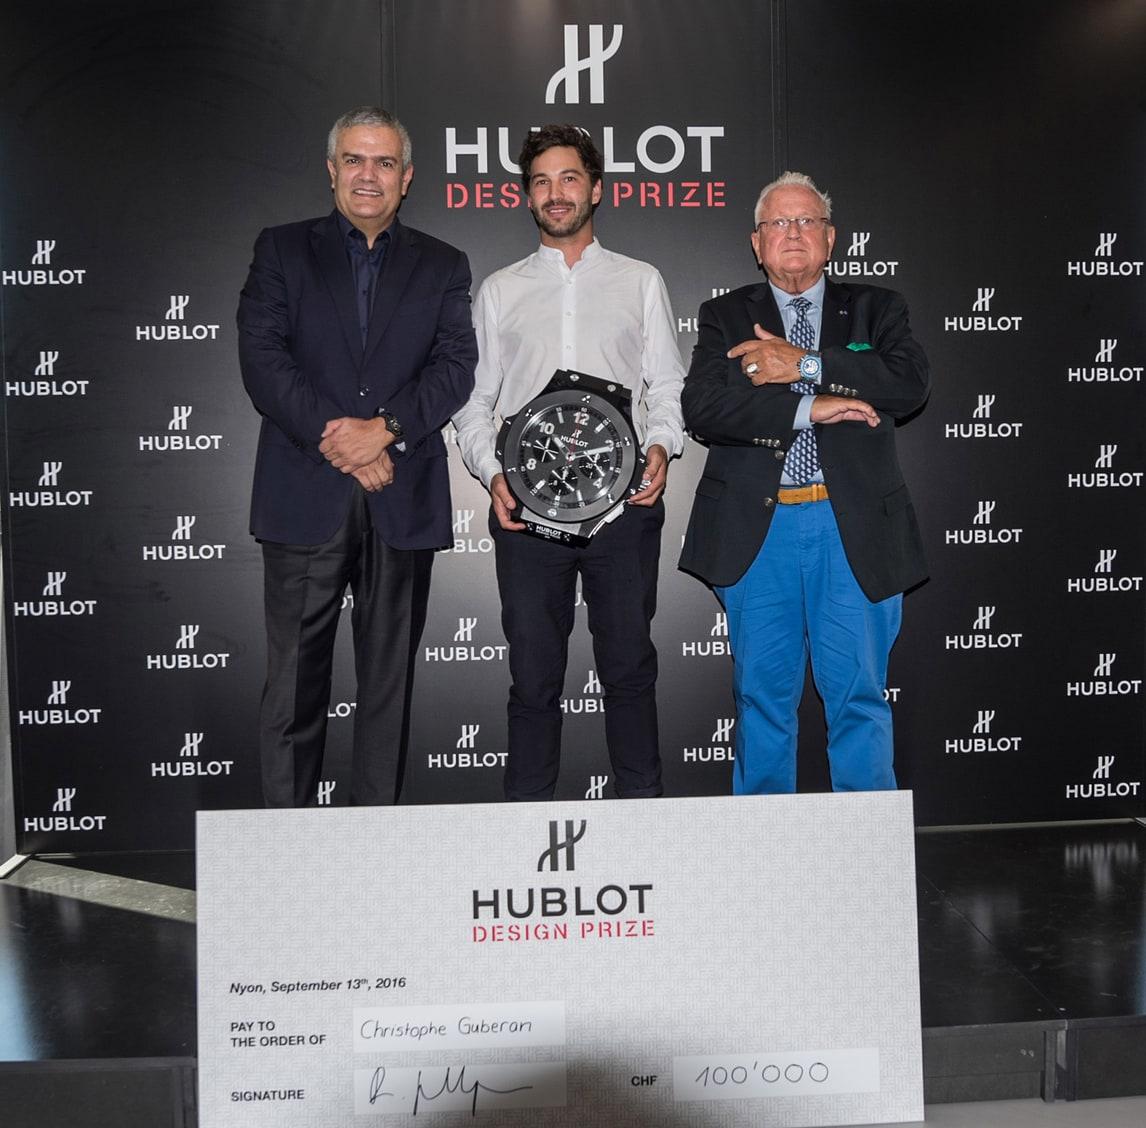 I protagonisti dell' Hublot Design Prize 2016